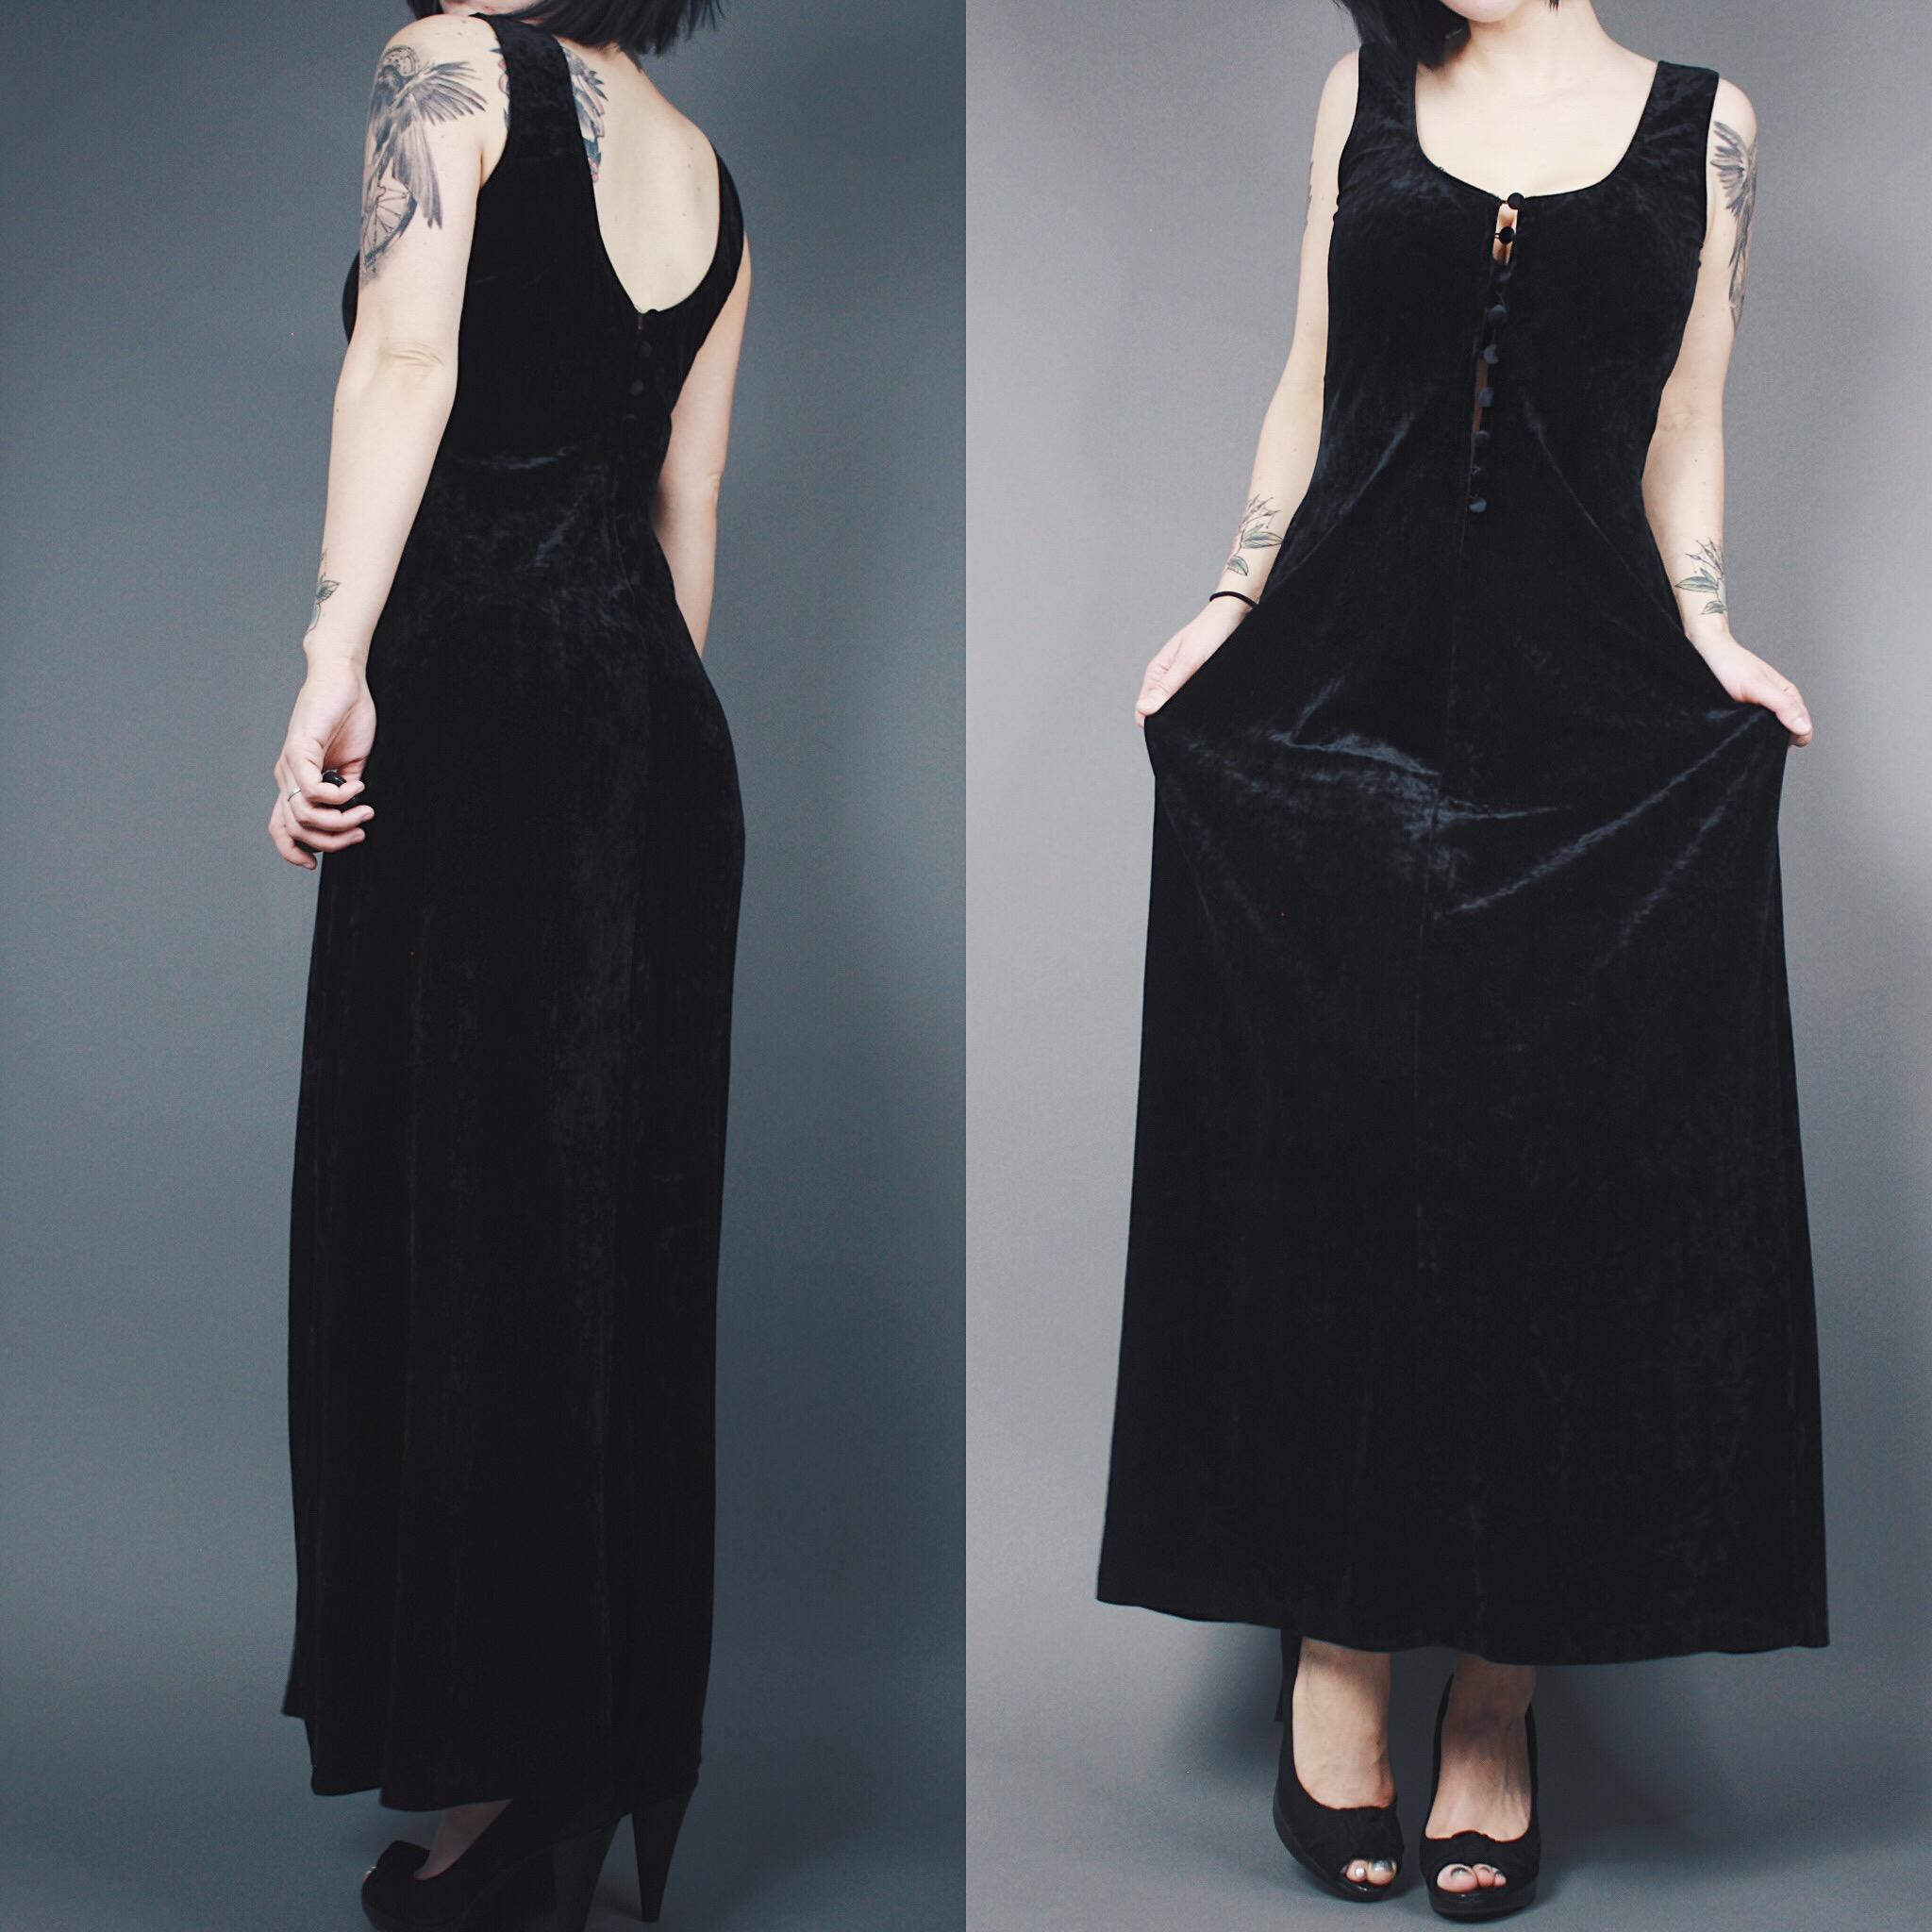 5d6af9e0c789f CLAIMED  thelittleasian - Vintage 90s Reversible Black Crushed Velvet Button  Down Sleeveless Maxi Dress -